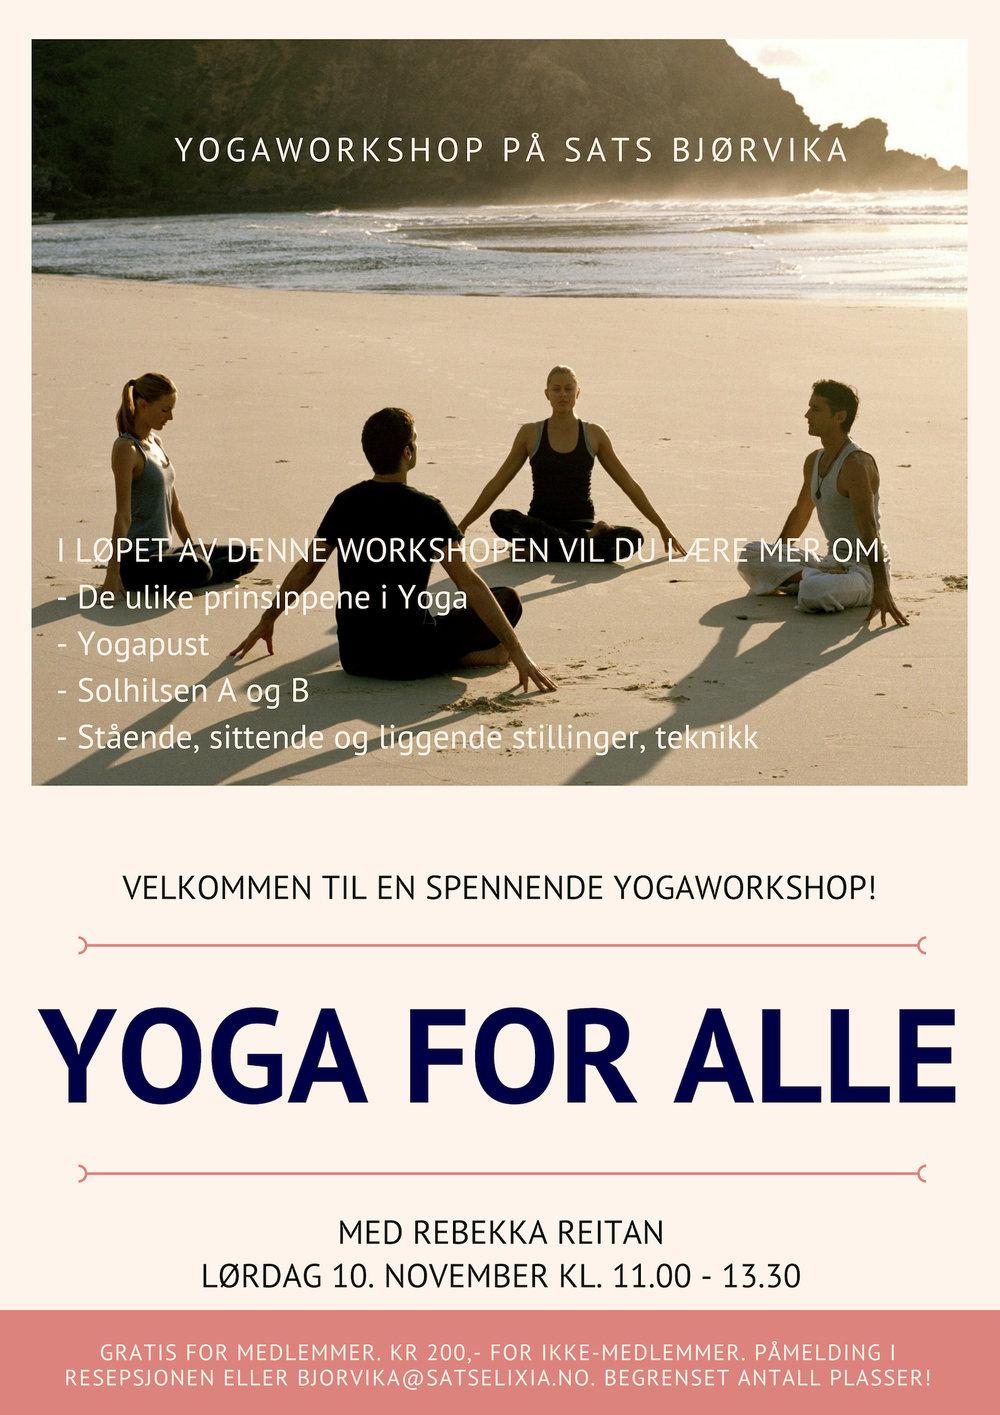 yoga for alle yogaworkshop oslo rebekka reitan yogalærer